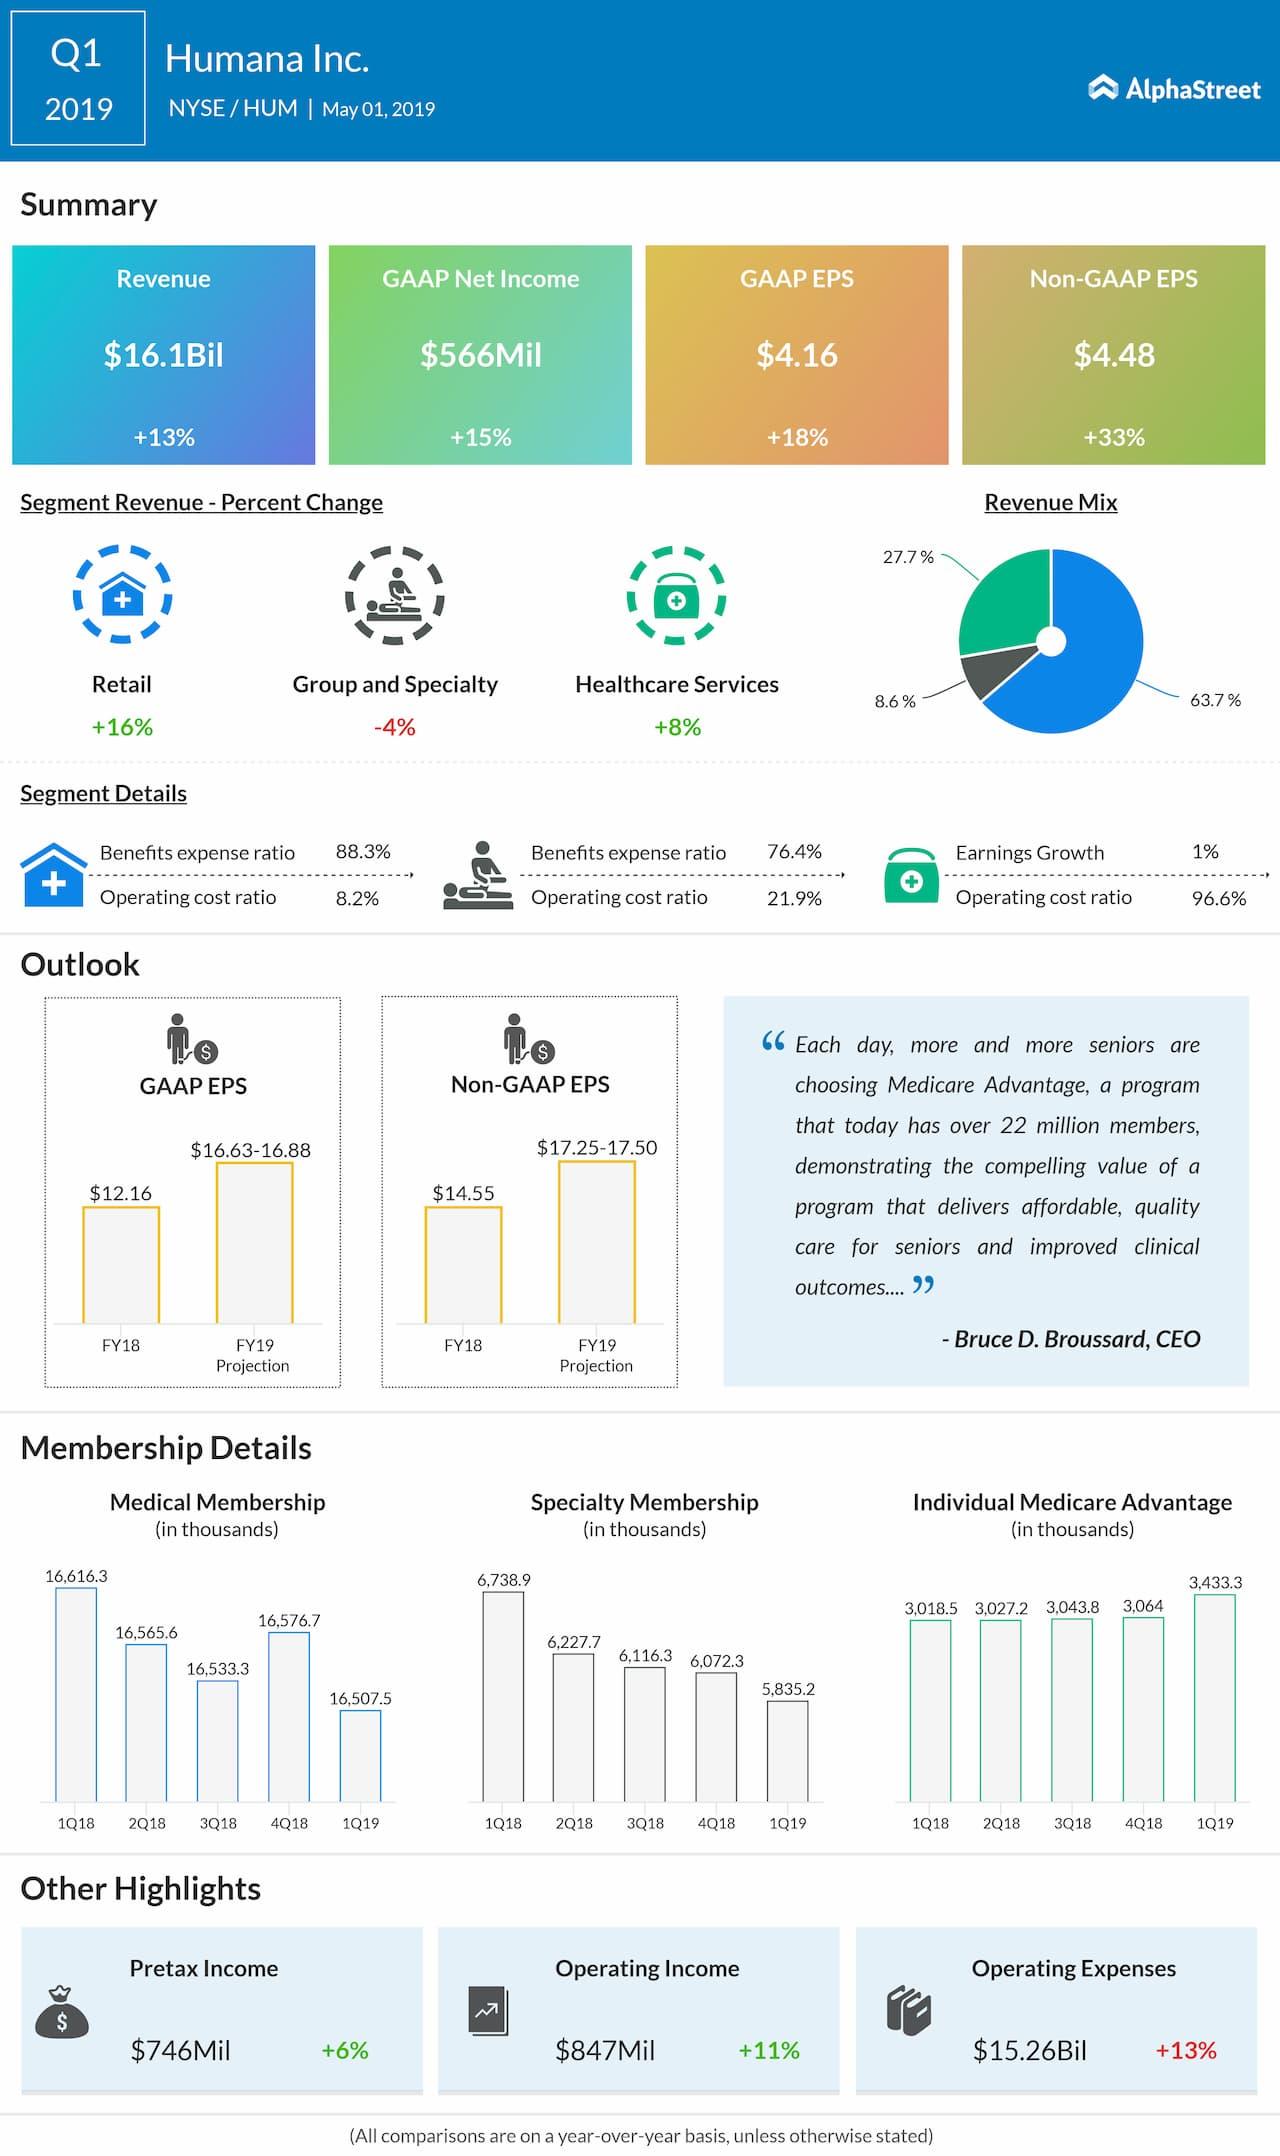 Humana Q1 2019 earnings infographic